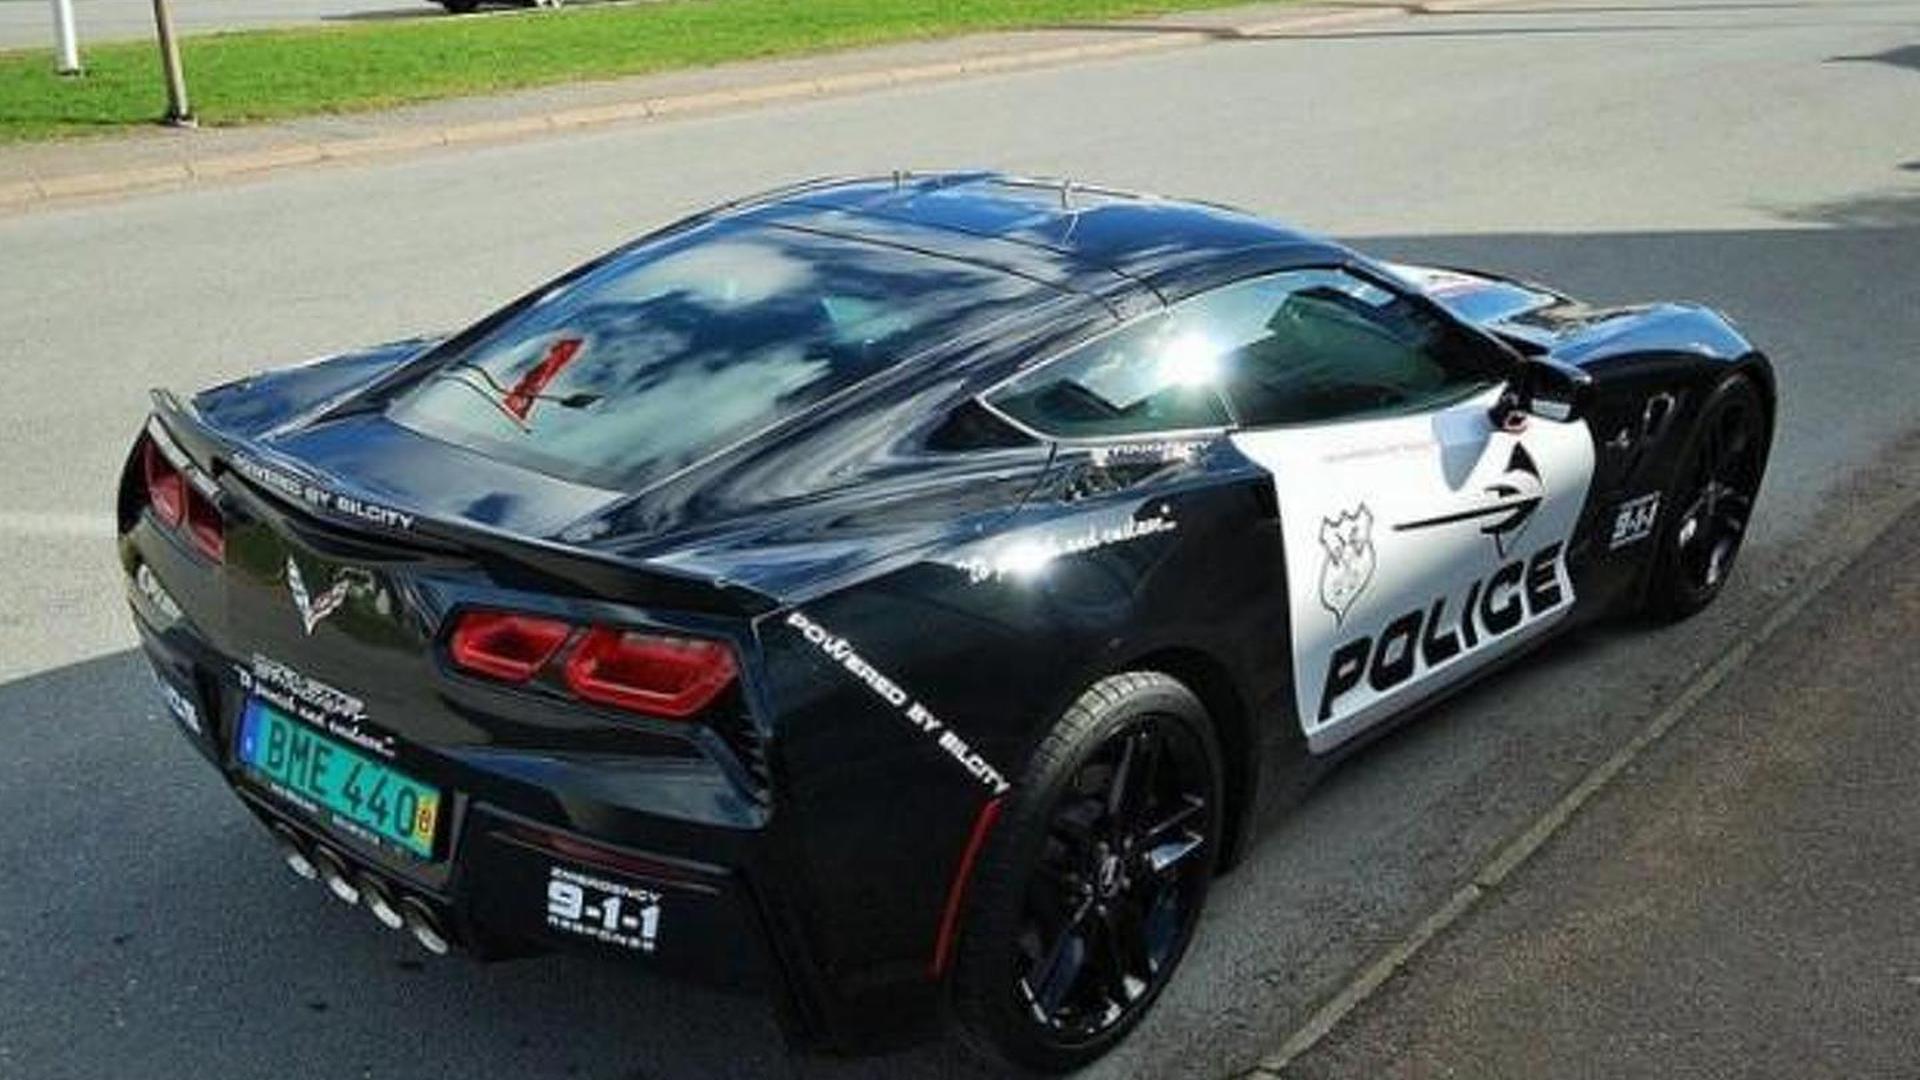 C7 Corvette For Sale >> Chevrolet C7 Corvette Stingray With Police Livery For Sale In Sweden